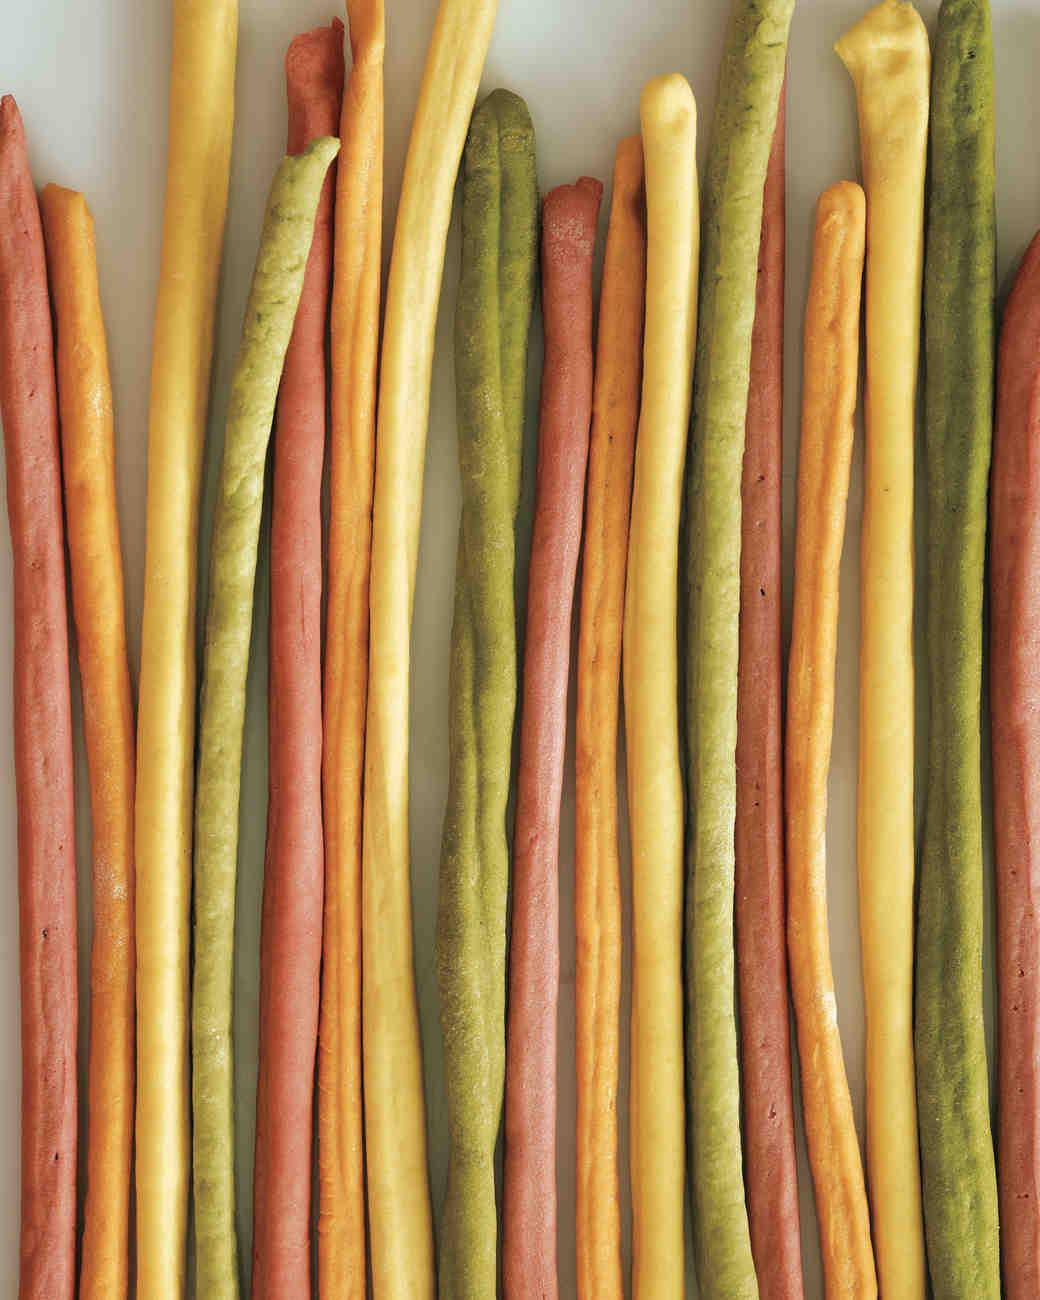 stripes-breadsticks-mwd108186.jpg